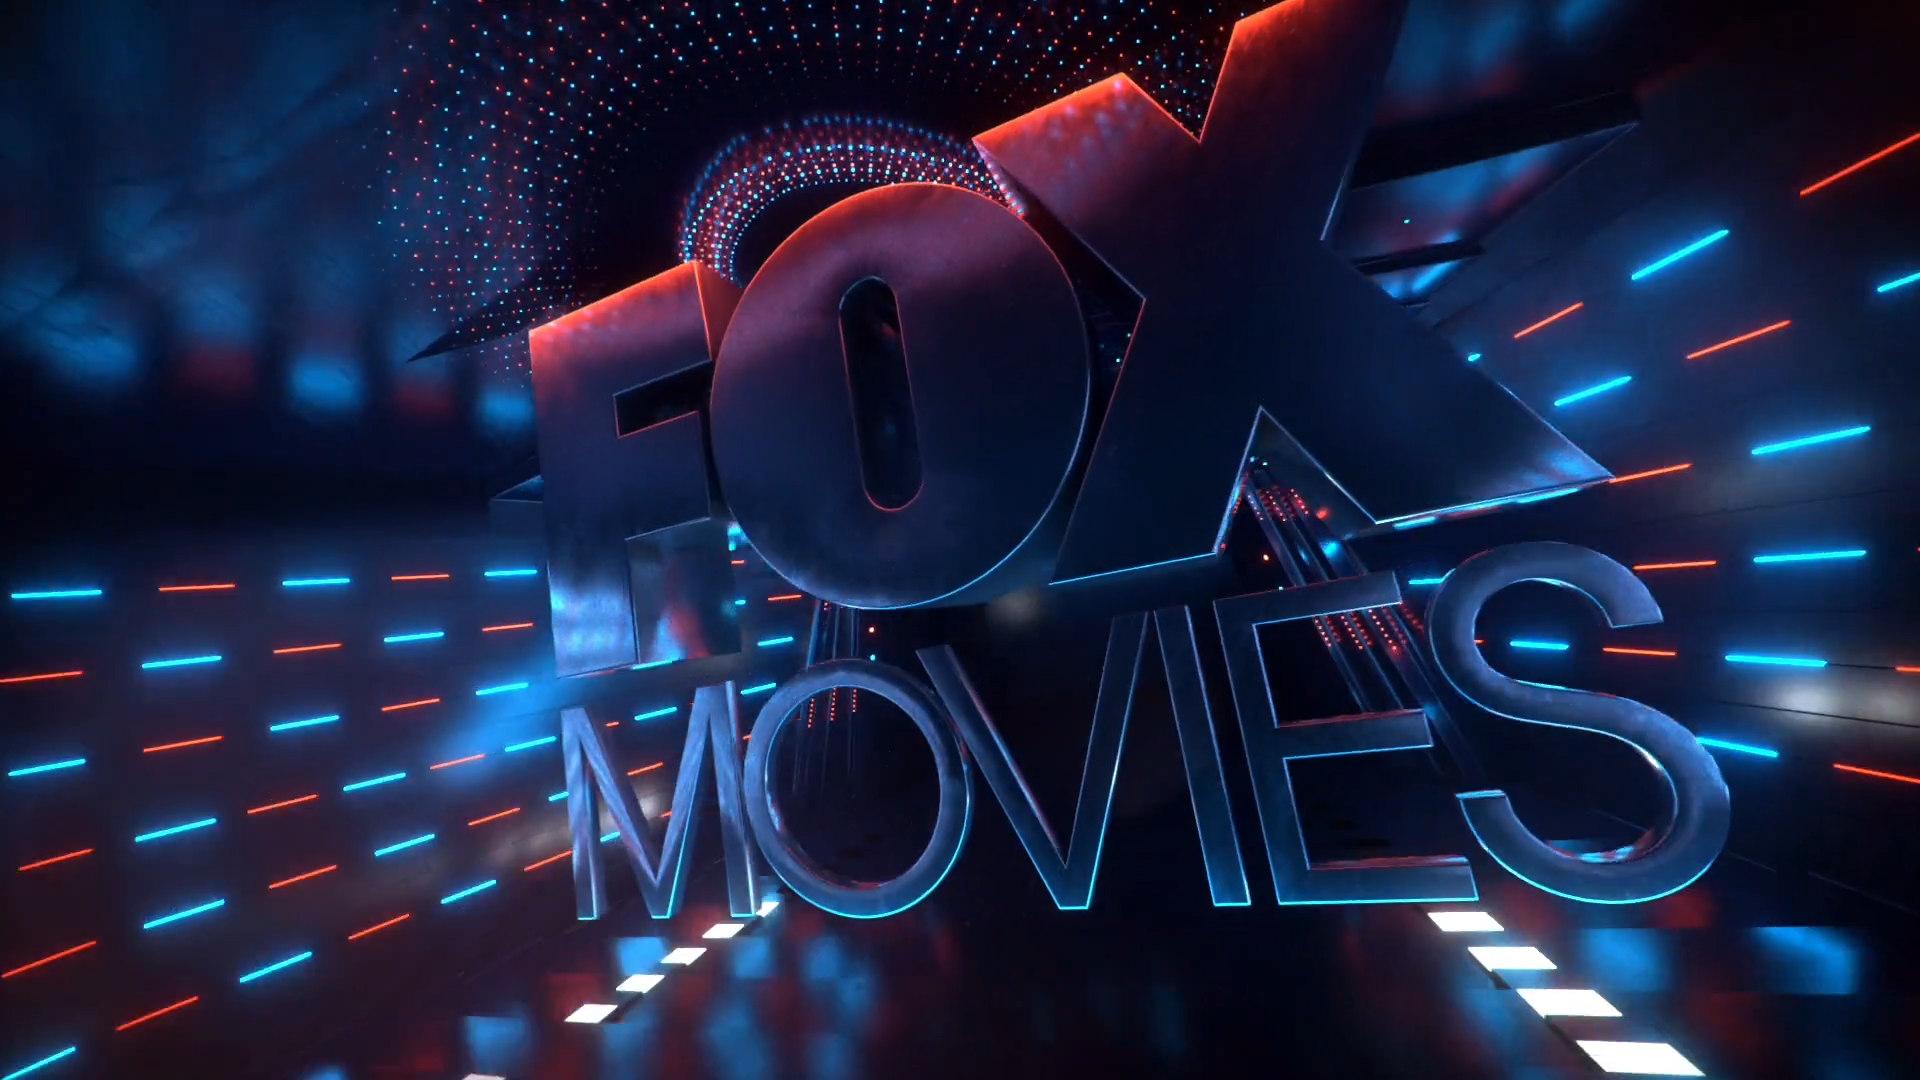 FOX movies | Animation | Compositing | Javier Bianchi